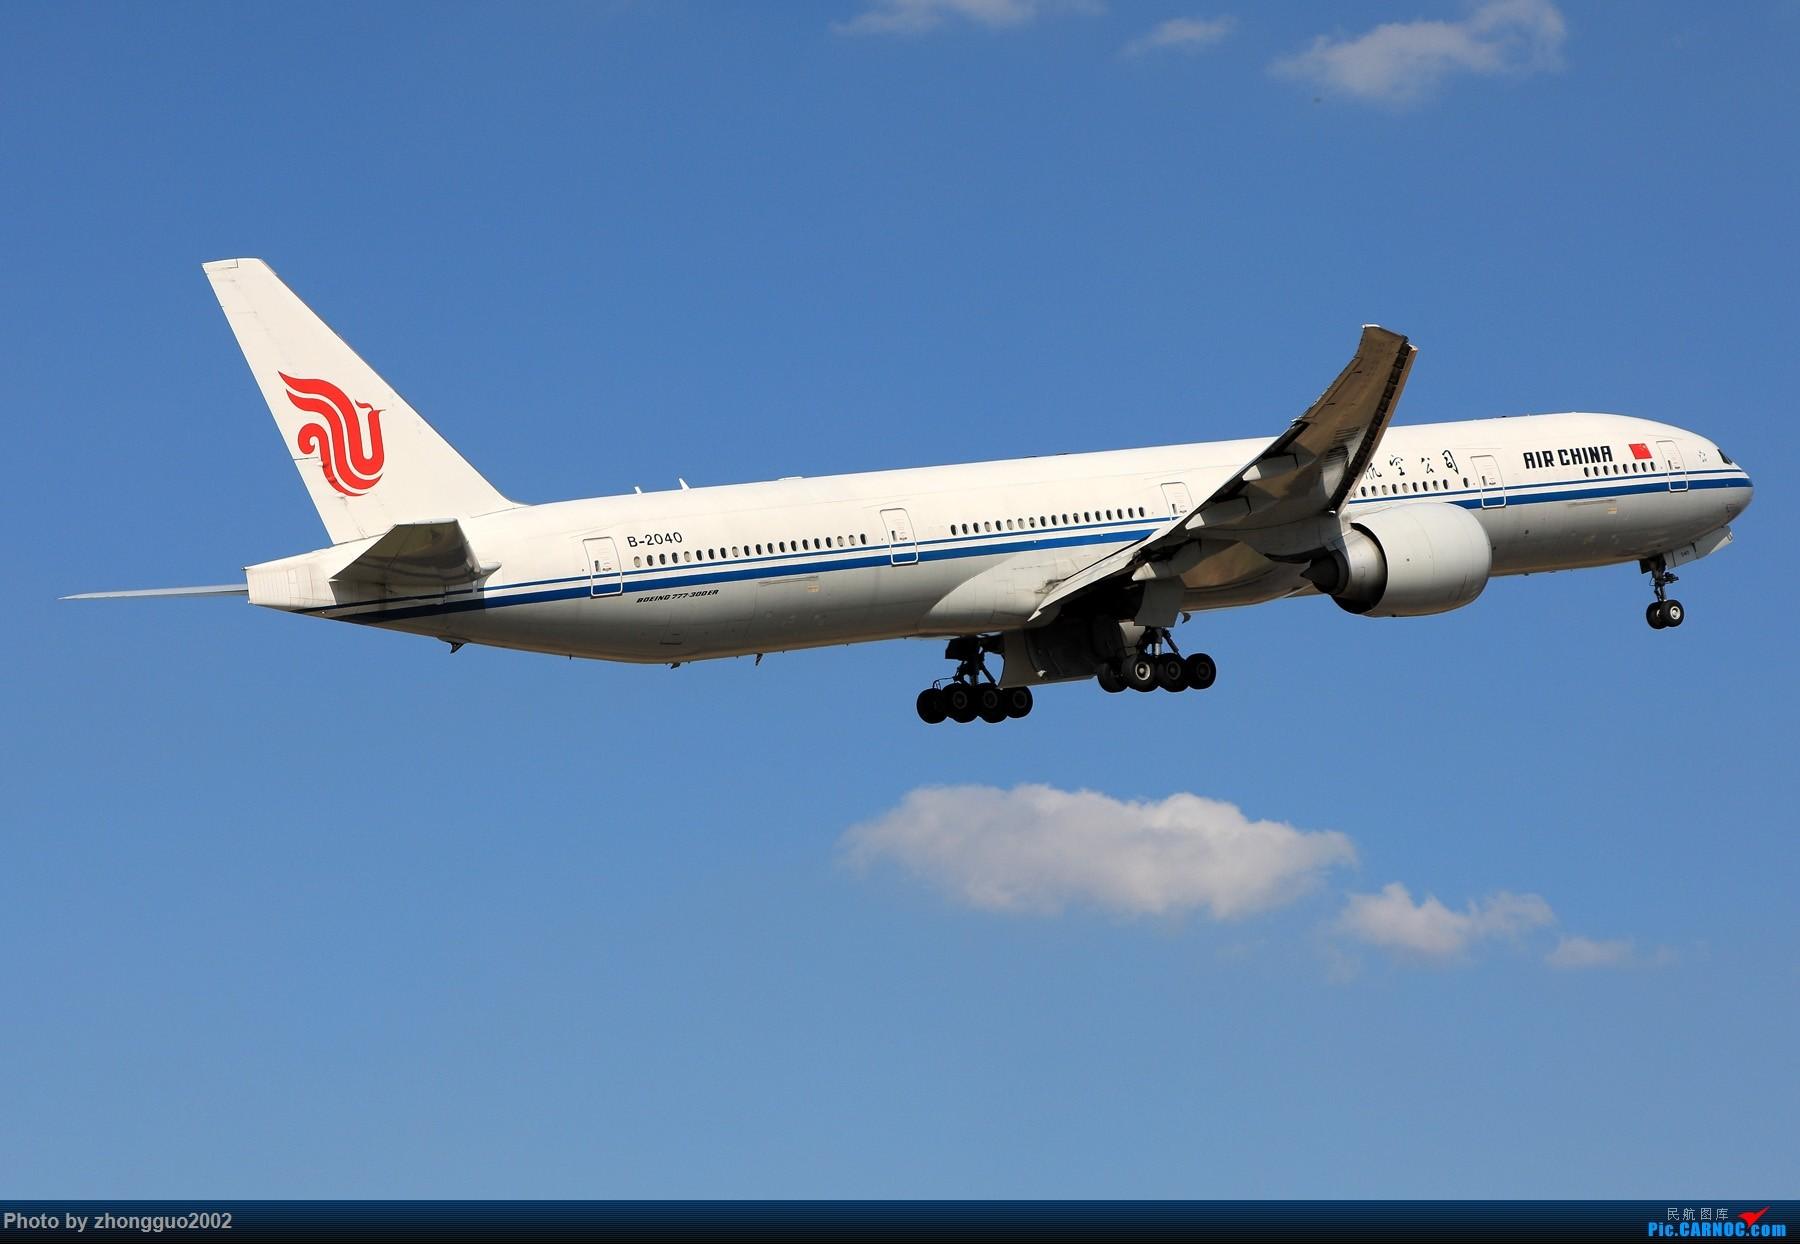 Re:[原创]鄂尔多斯日常训练 BOEING 777-300ER B-2040 中国鄂尔多斯伊金霍洛机场